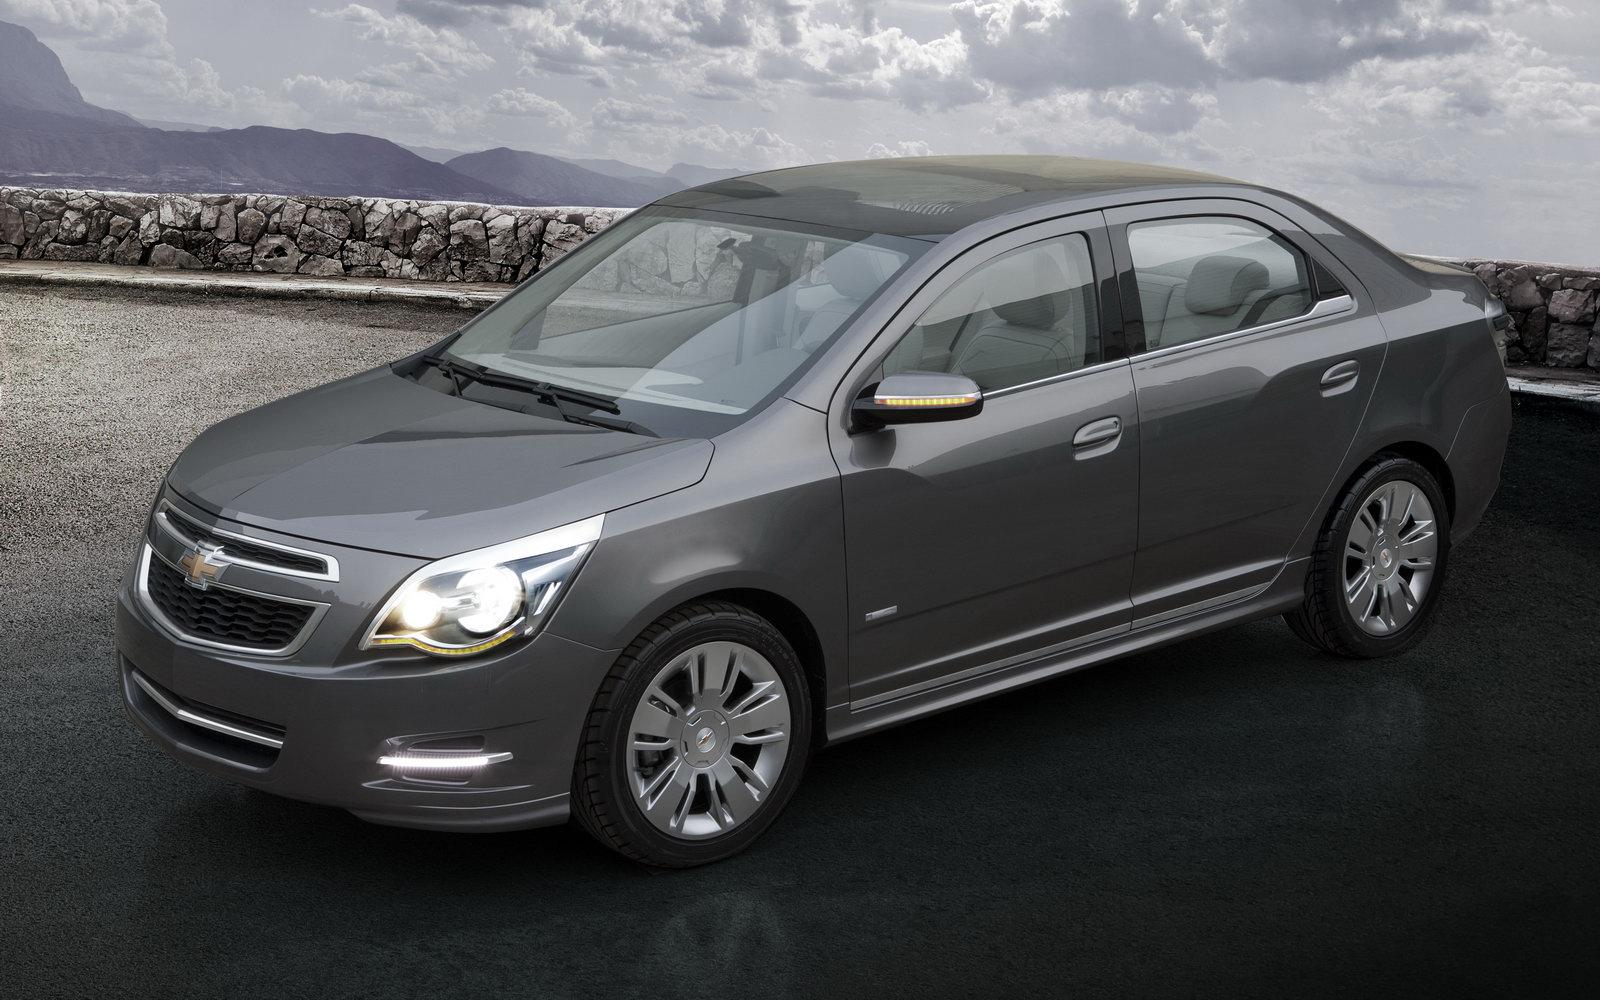 Тюнинг Chevrolet Cobalt, фото тюнинга экстерьера Шевроле ...: http://mashintop.ru/articles.php?id=1386